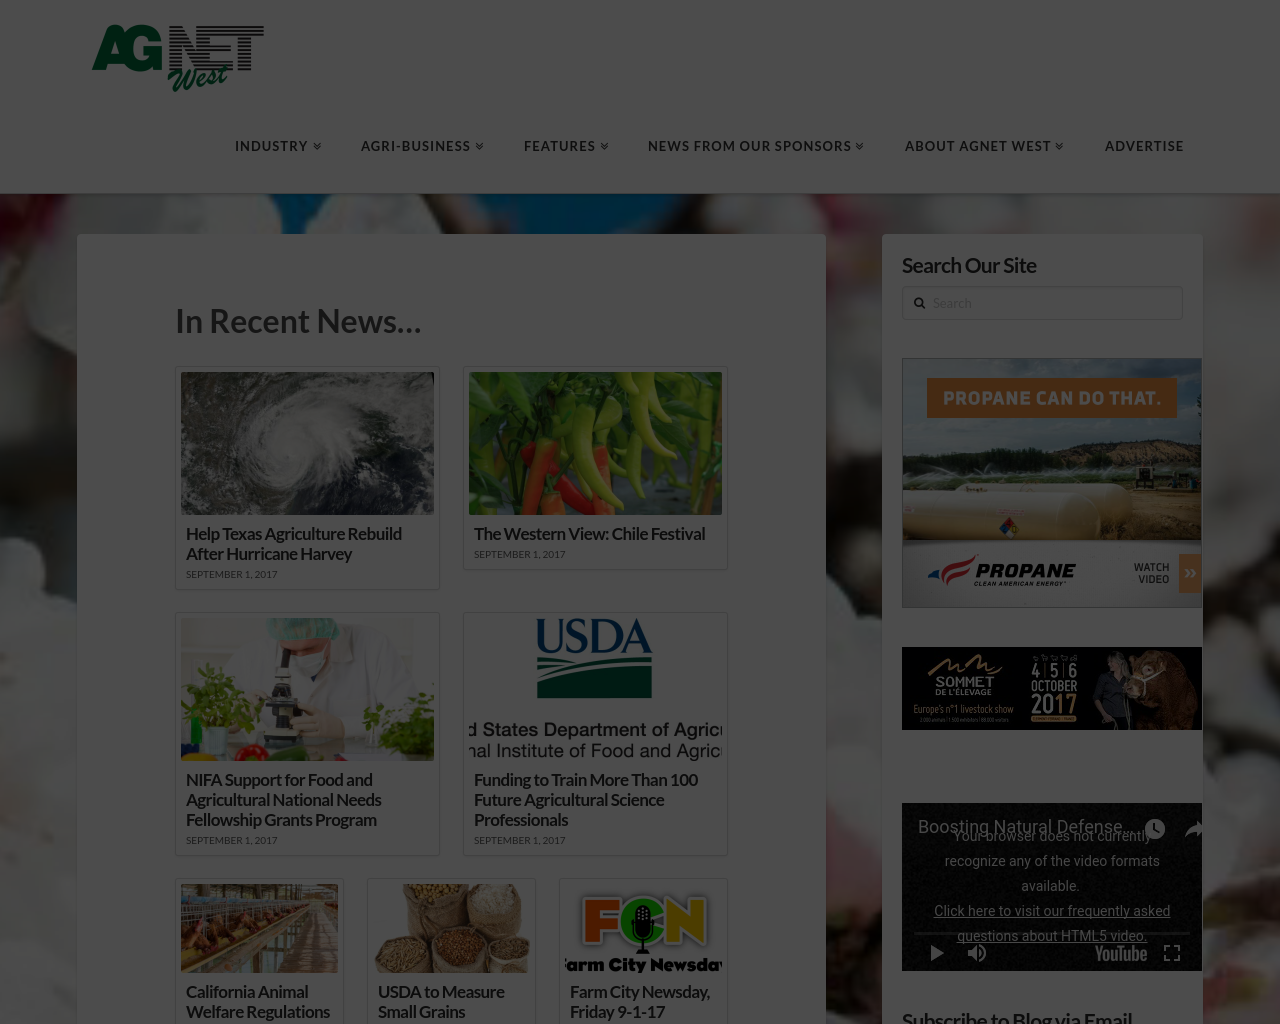 AgNetWest.com-Advertising-Reviews-Pricing